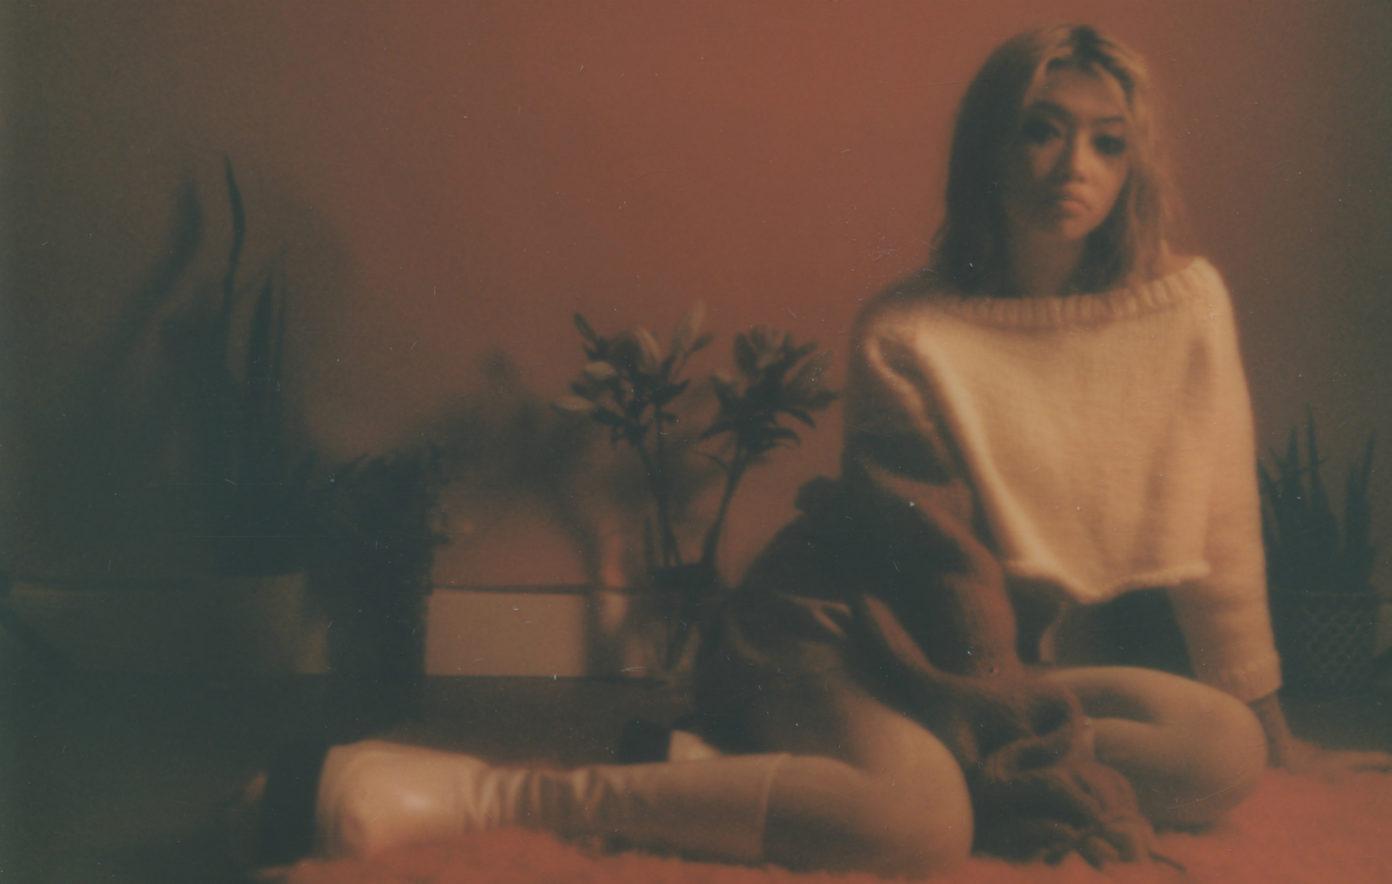 Beabadoobee Shares Long-Awaited Debut Album 'Fake It Flowers'